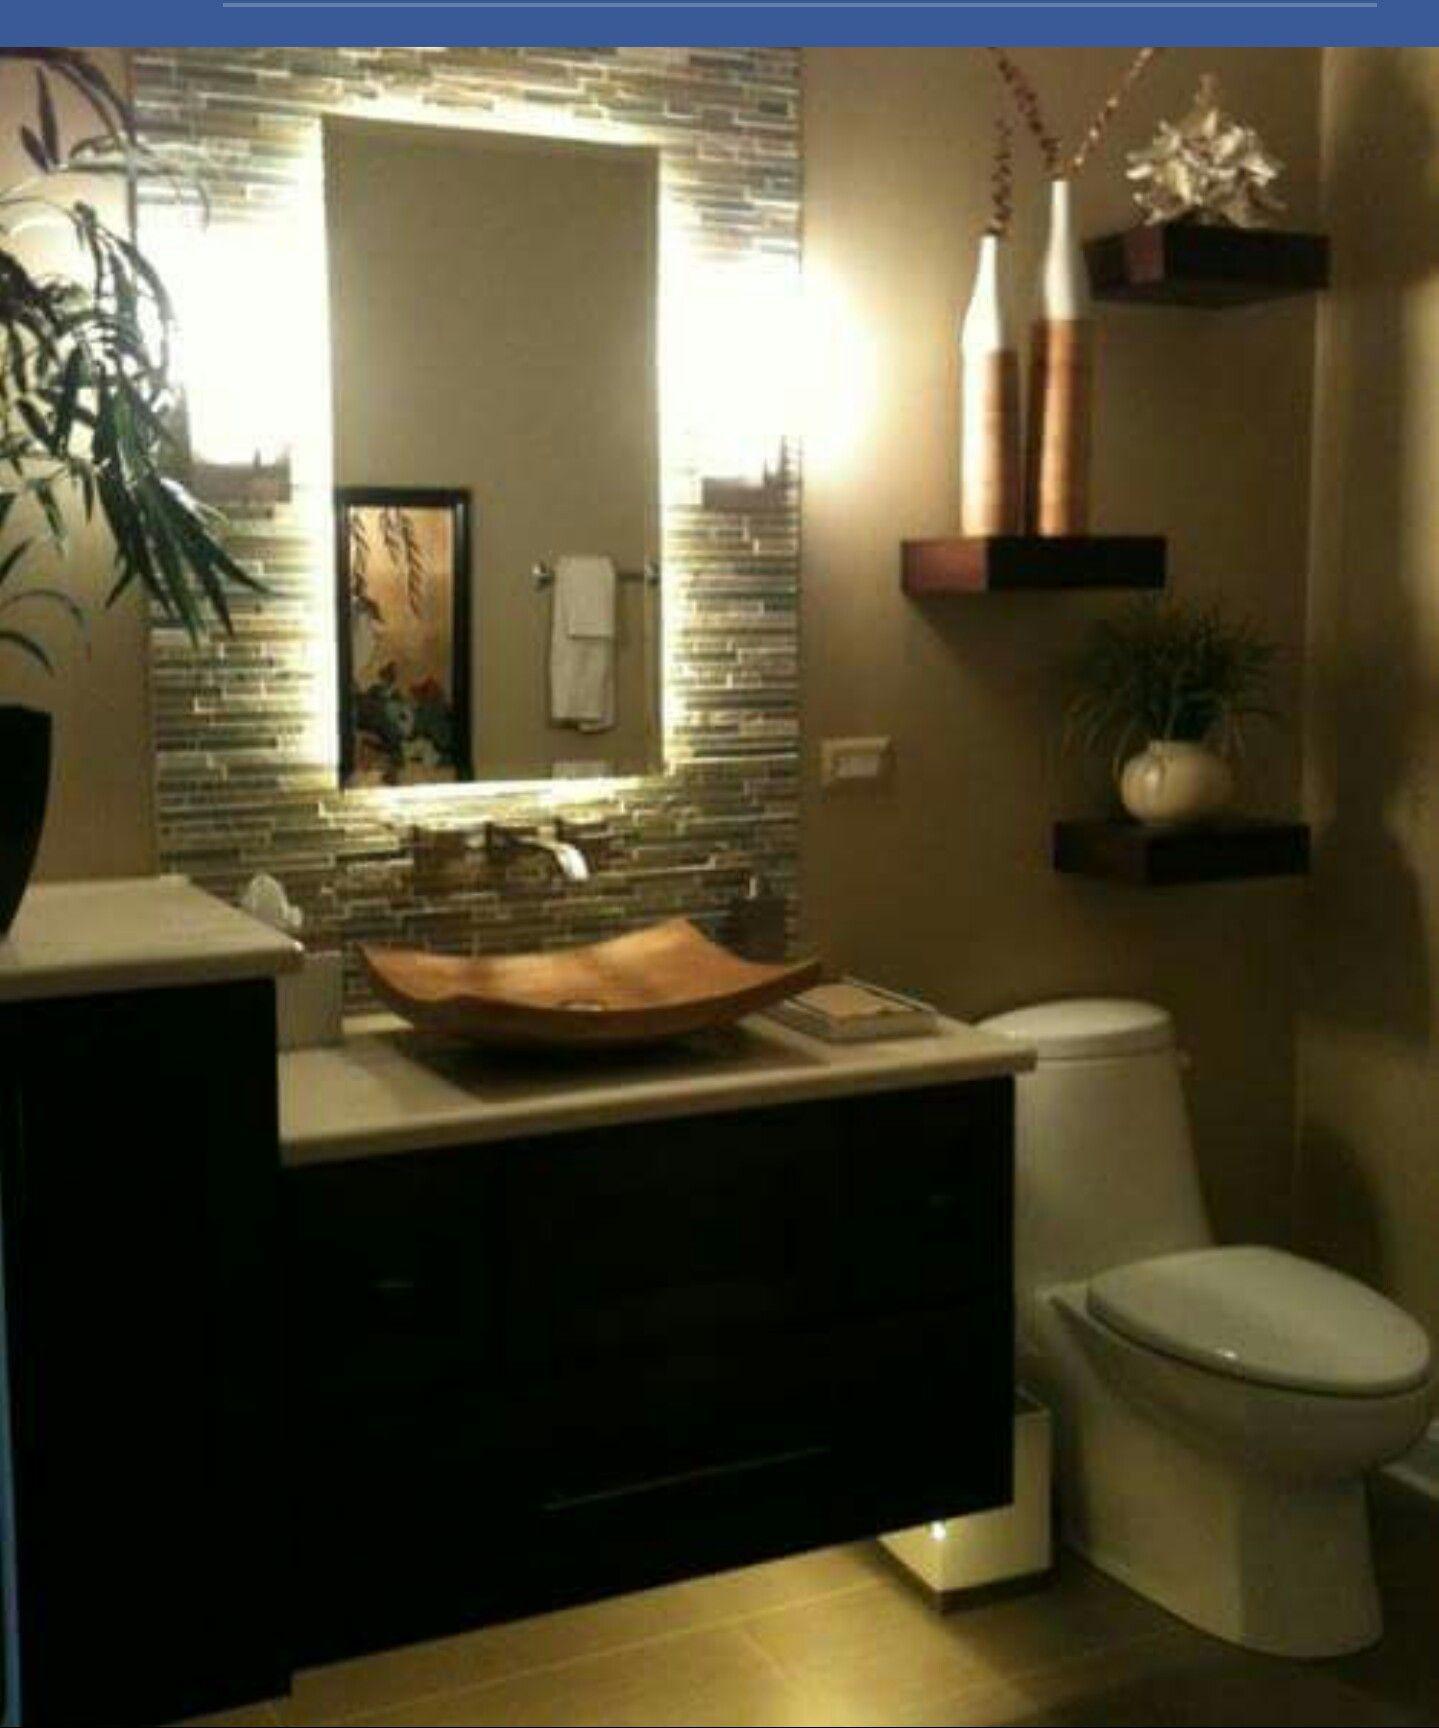 Pin de Southern & Gemini en Bathroom Obsession   Pinterest   Cuarto ...